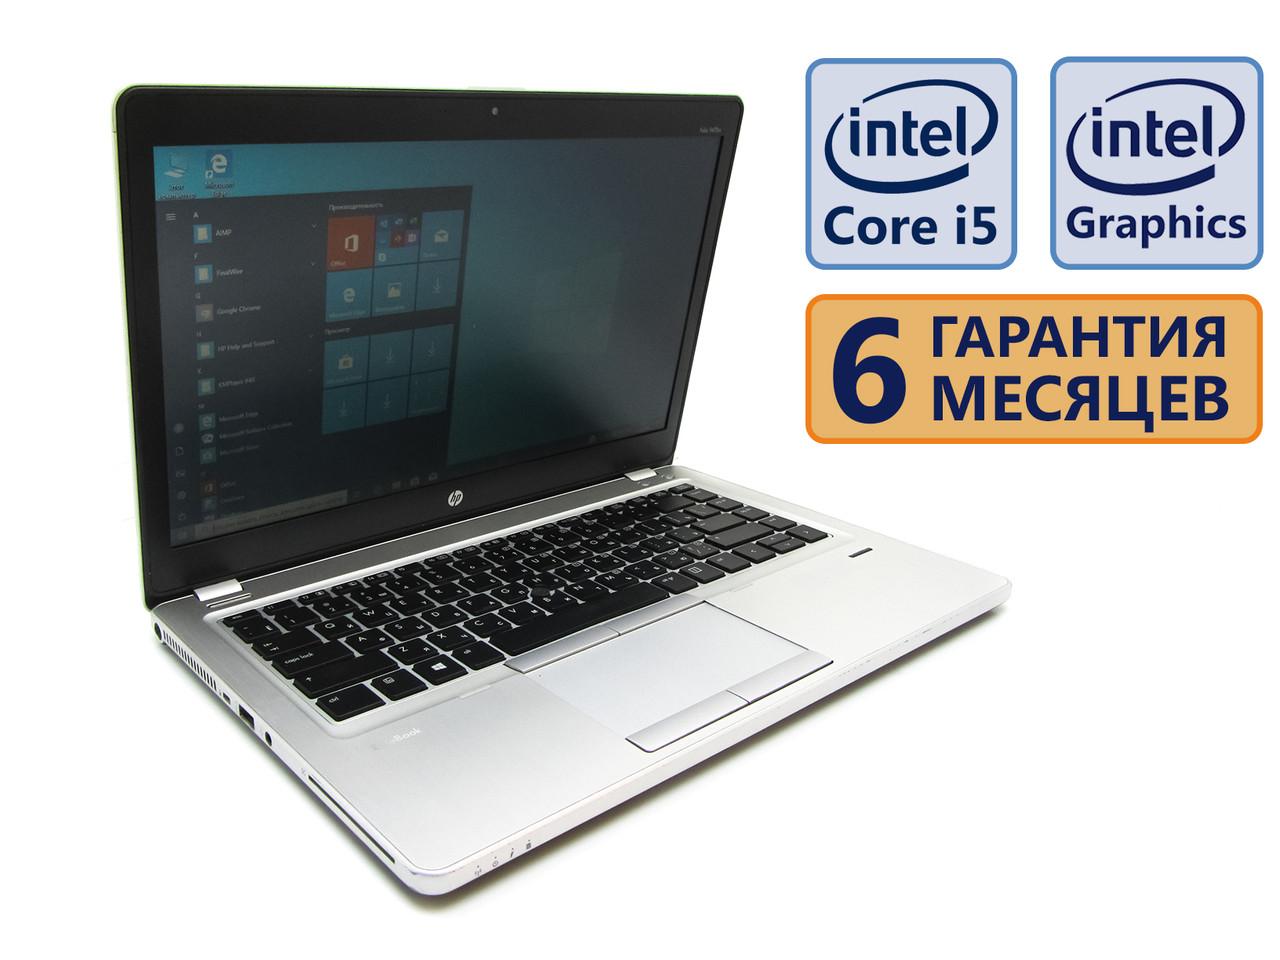 Ноутбук HP EliteBook Folio 9470m 14.0 (1366x768)/ Core  i5-3437U (2x max2.90GHz)/ RAM 8GB/ SSD 240GB/ БАТ 22Wh./ Сост 9/10 БУ